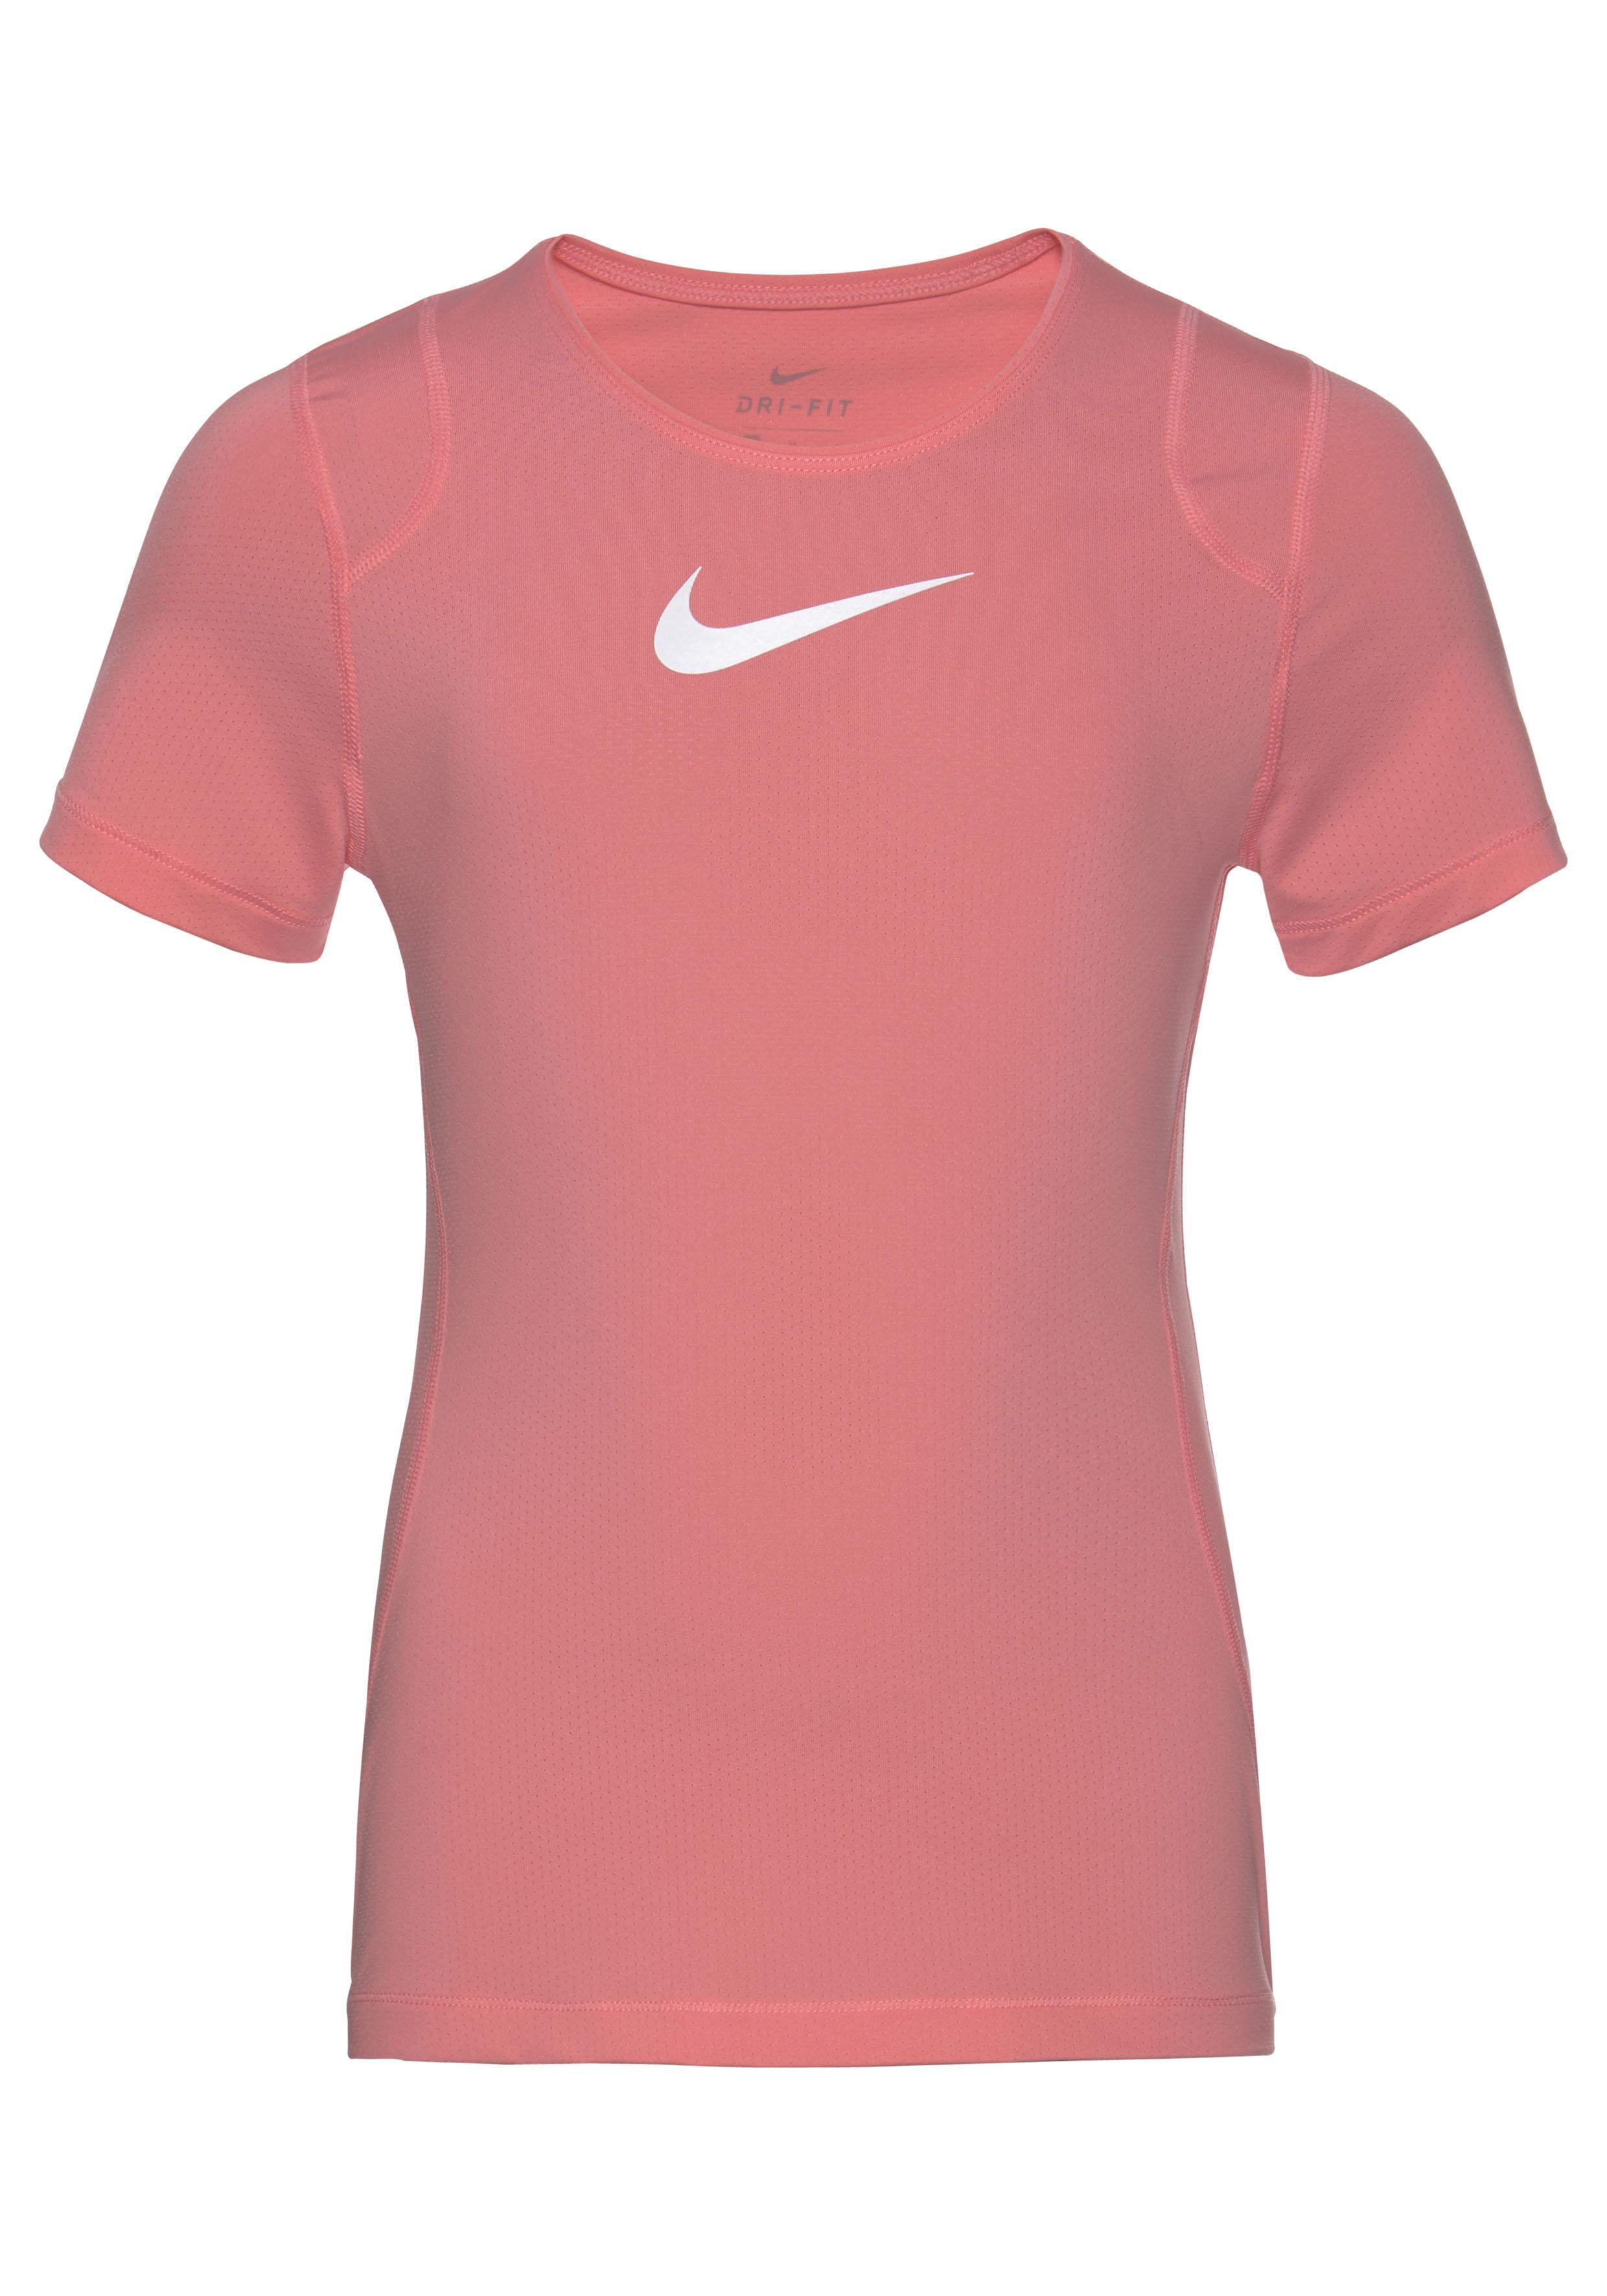 Nike Funktionsshirt GIRLS NIKE PERFORMANCE TOP SHORTSLEEVE | Bekleidung > Shirts > Funktionsshirts | Nike